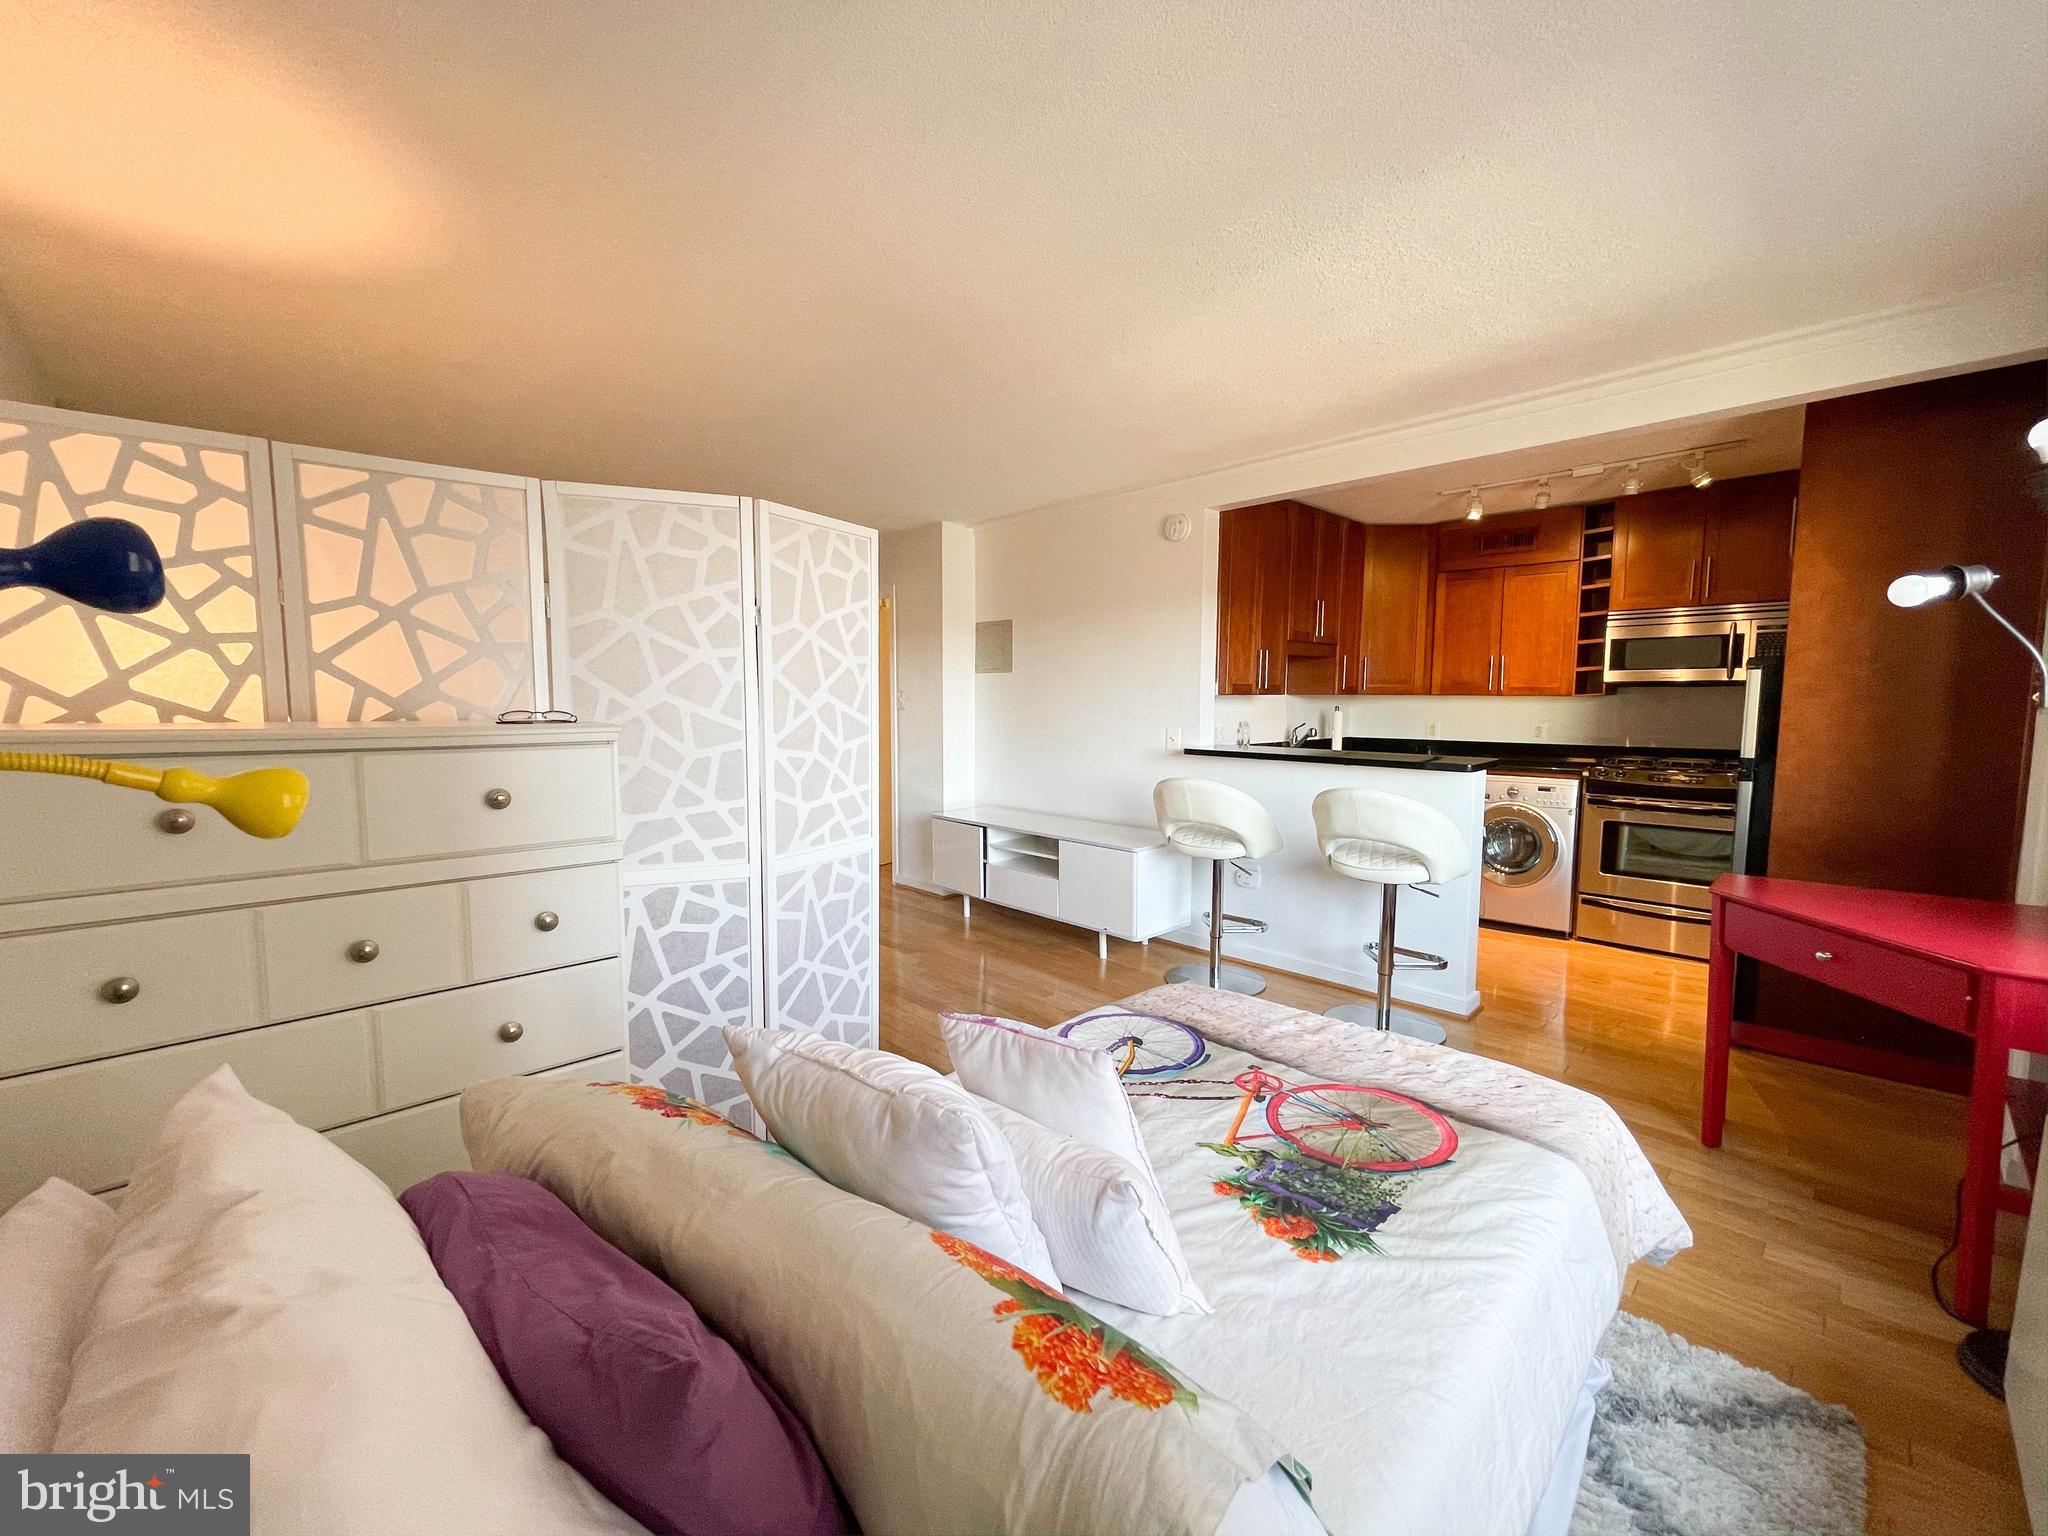 7333 NEW HAMPSHIRE AVENUE, TAKOMA PARK, Maryland 20912, ,1 BathroomBathrooms,Condominium,For Sale,7333 NEW HAMPSHIRE AVENUE,MDMC748186